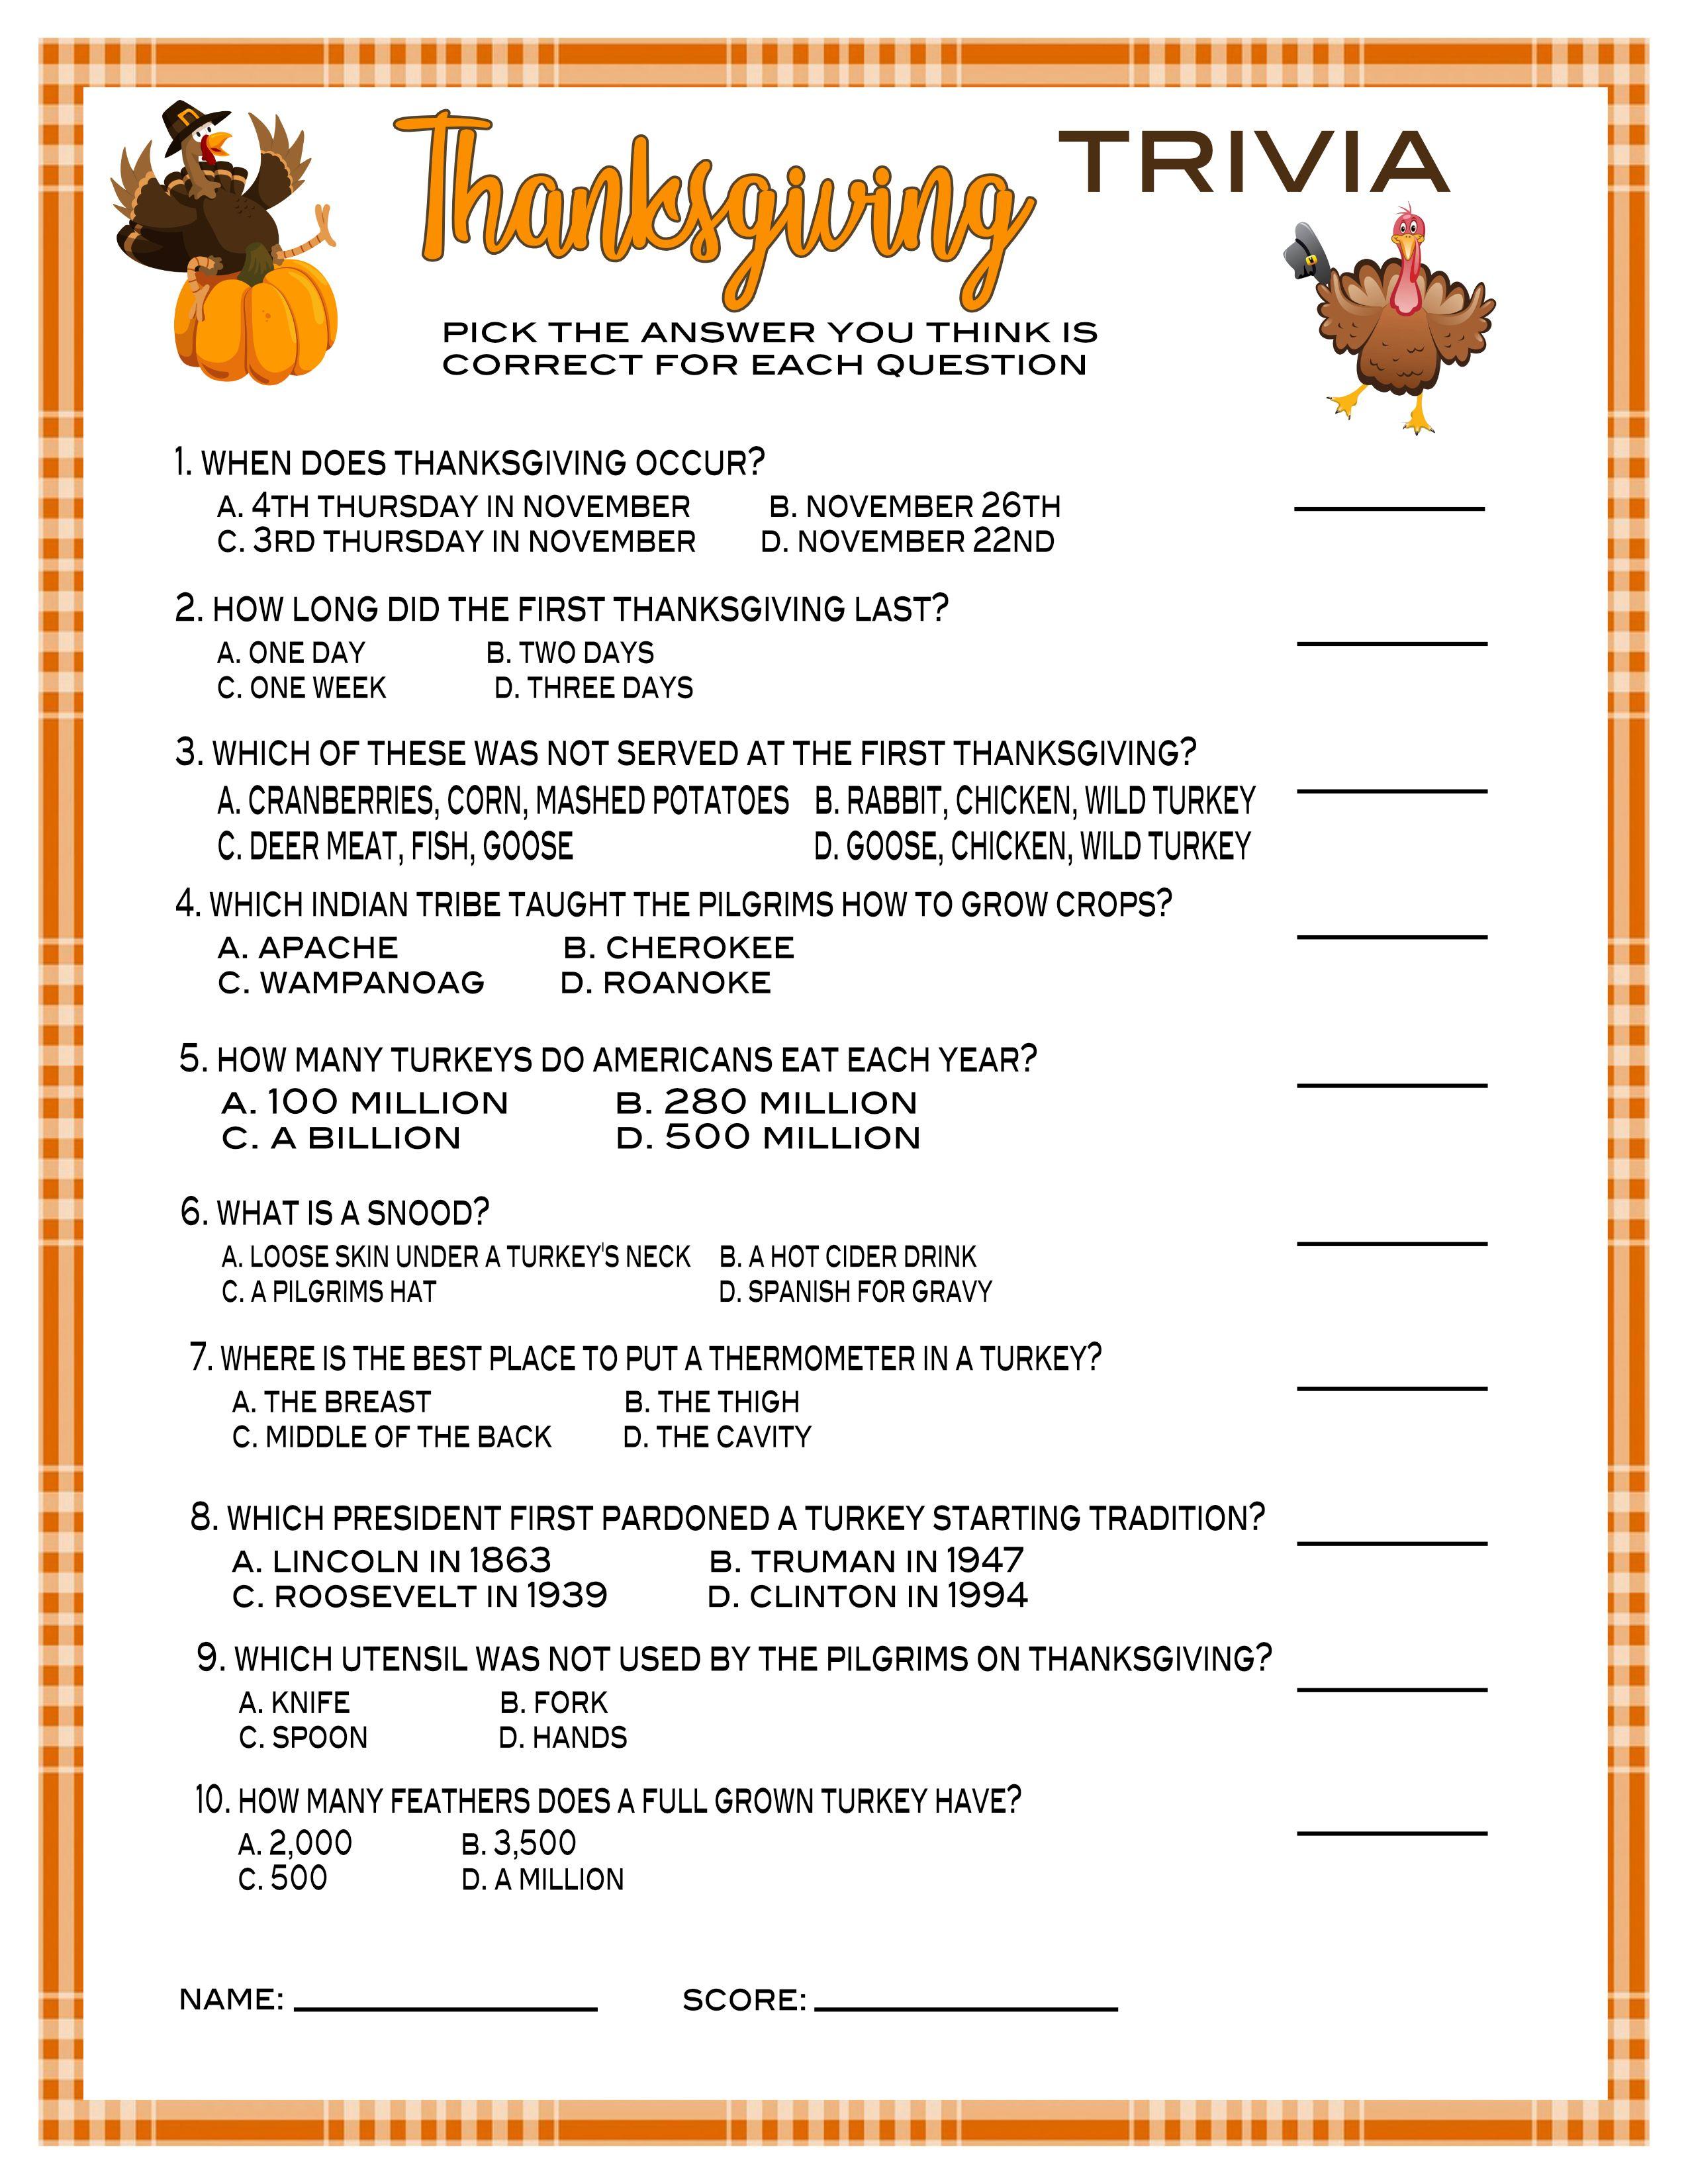 13 Thanksgiving Games Friendsgiving Games Trivia Family Games Activities Printable Or Virtual Party Games Instant Download In 2020 Thanksgiving Family Games Friendsgiving Games Thanksgiving Games